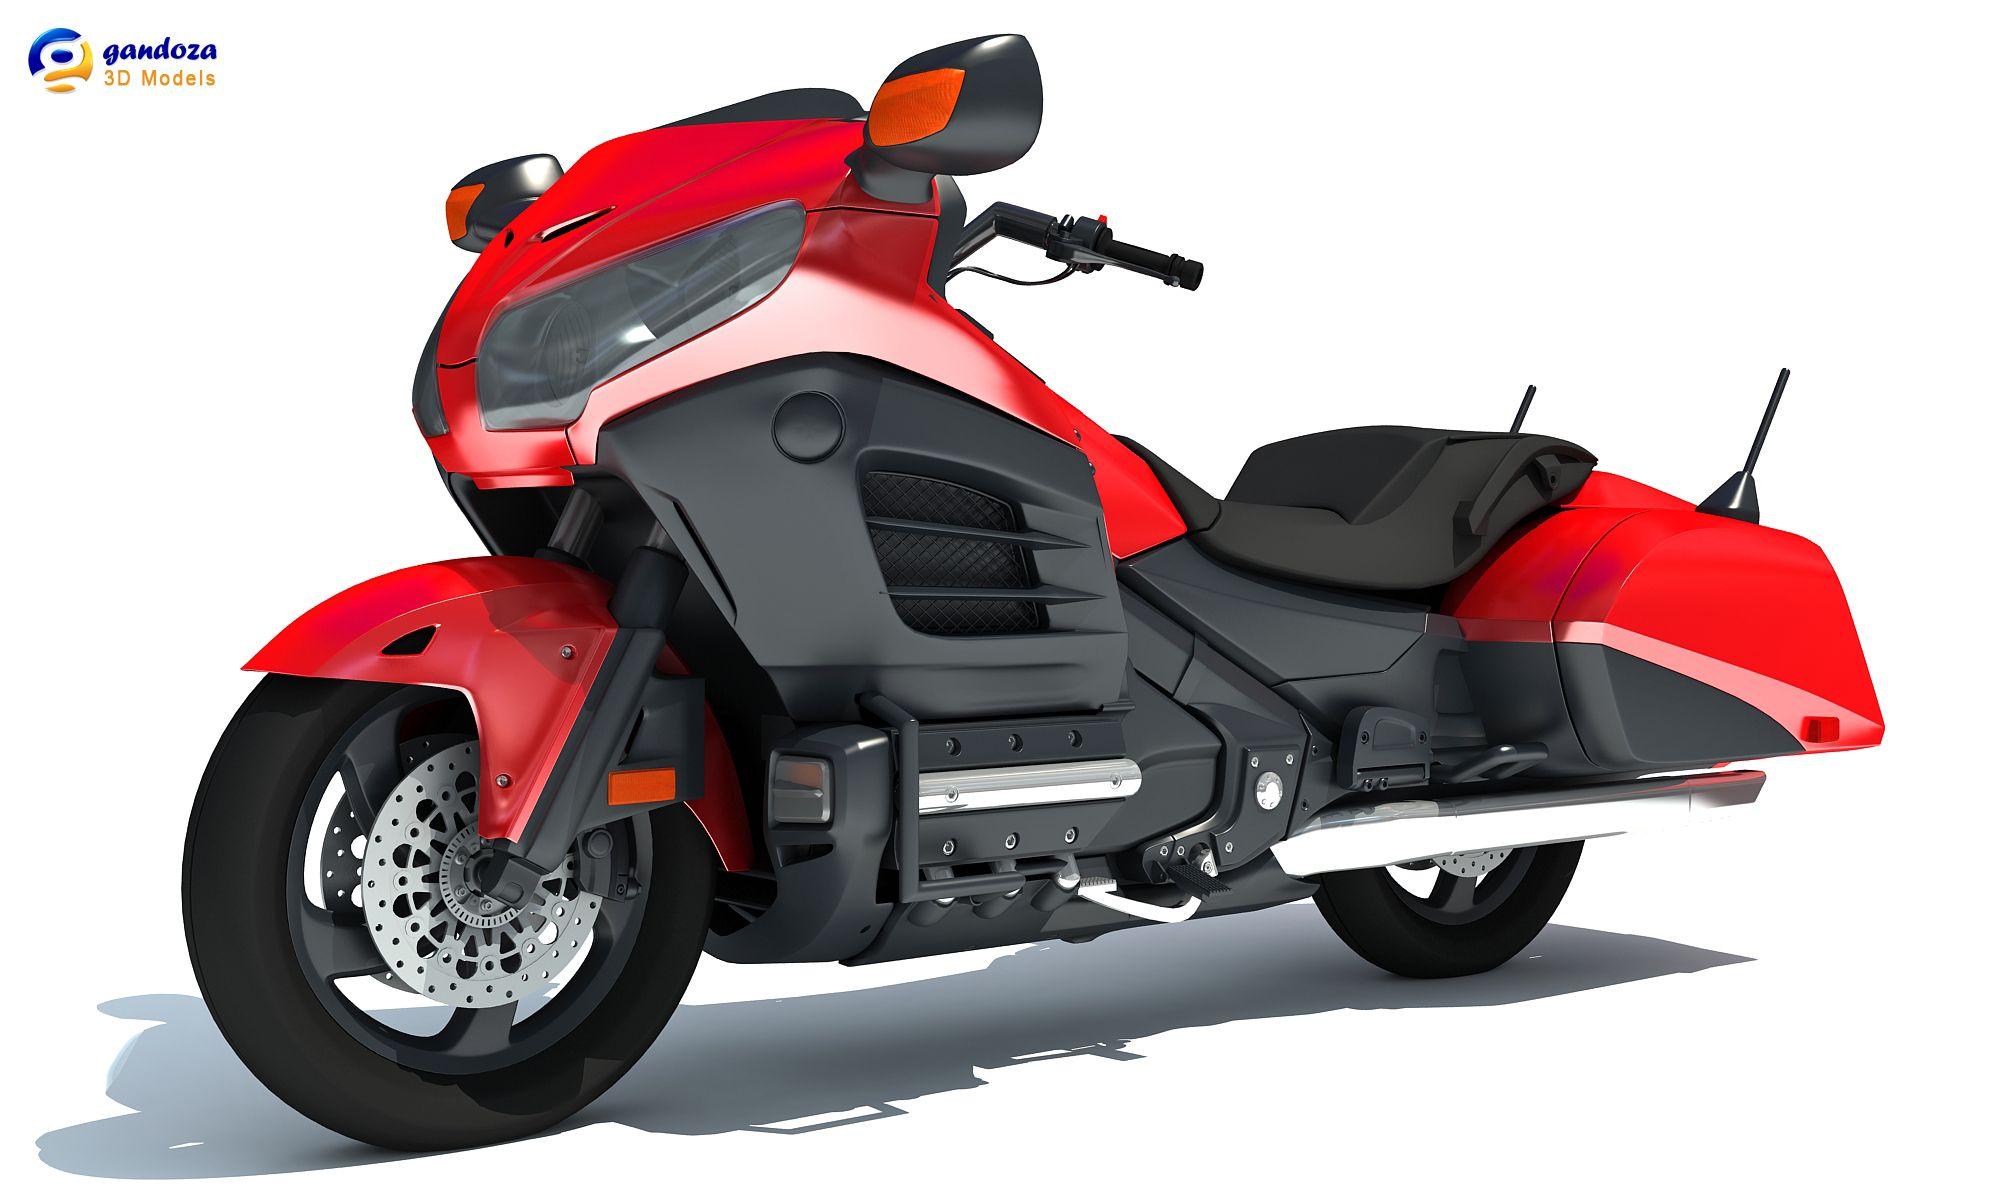 honda goldwing motorcycle models  Honda Goldwing Motorcycle 3D Model | Hot Rides | Pinterest | Honda